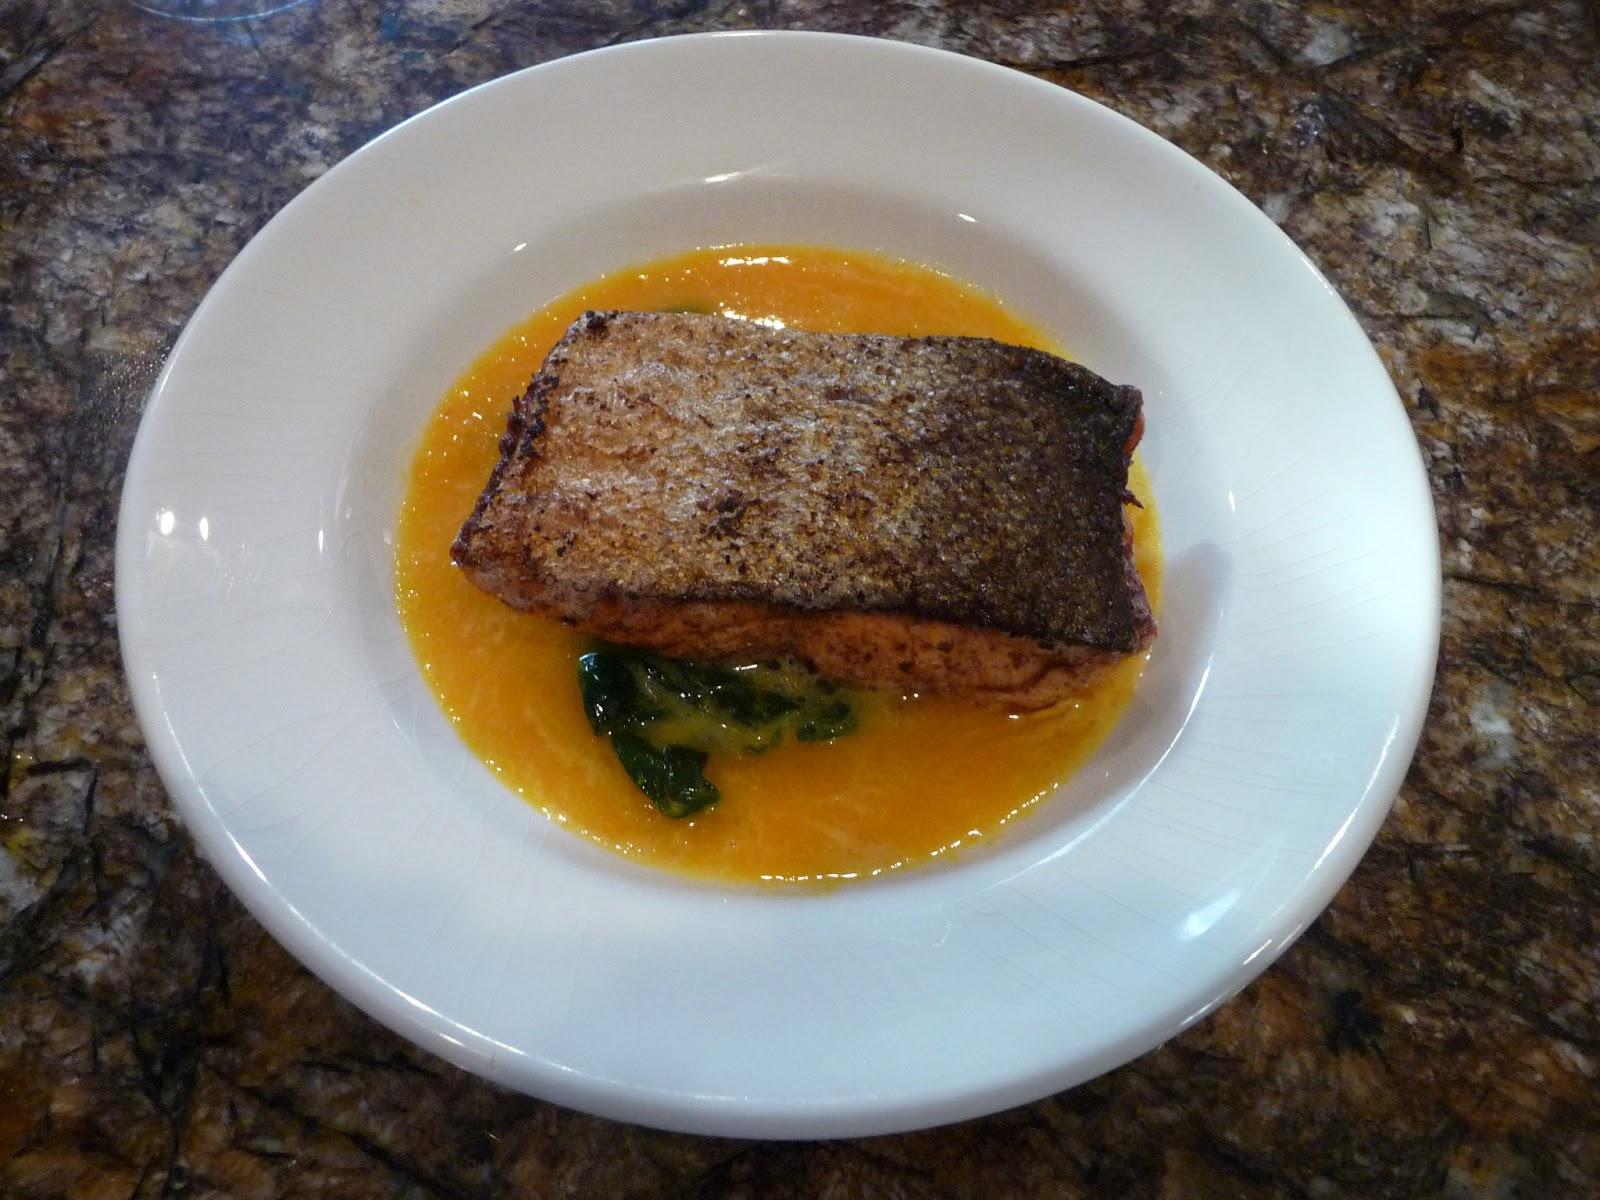 Chef Bolek: Copper River Sockeye Salmon with an Orange-Saffron Sauce